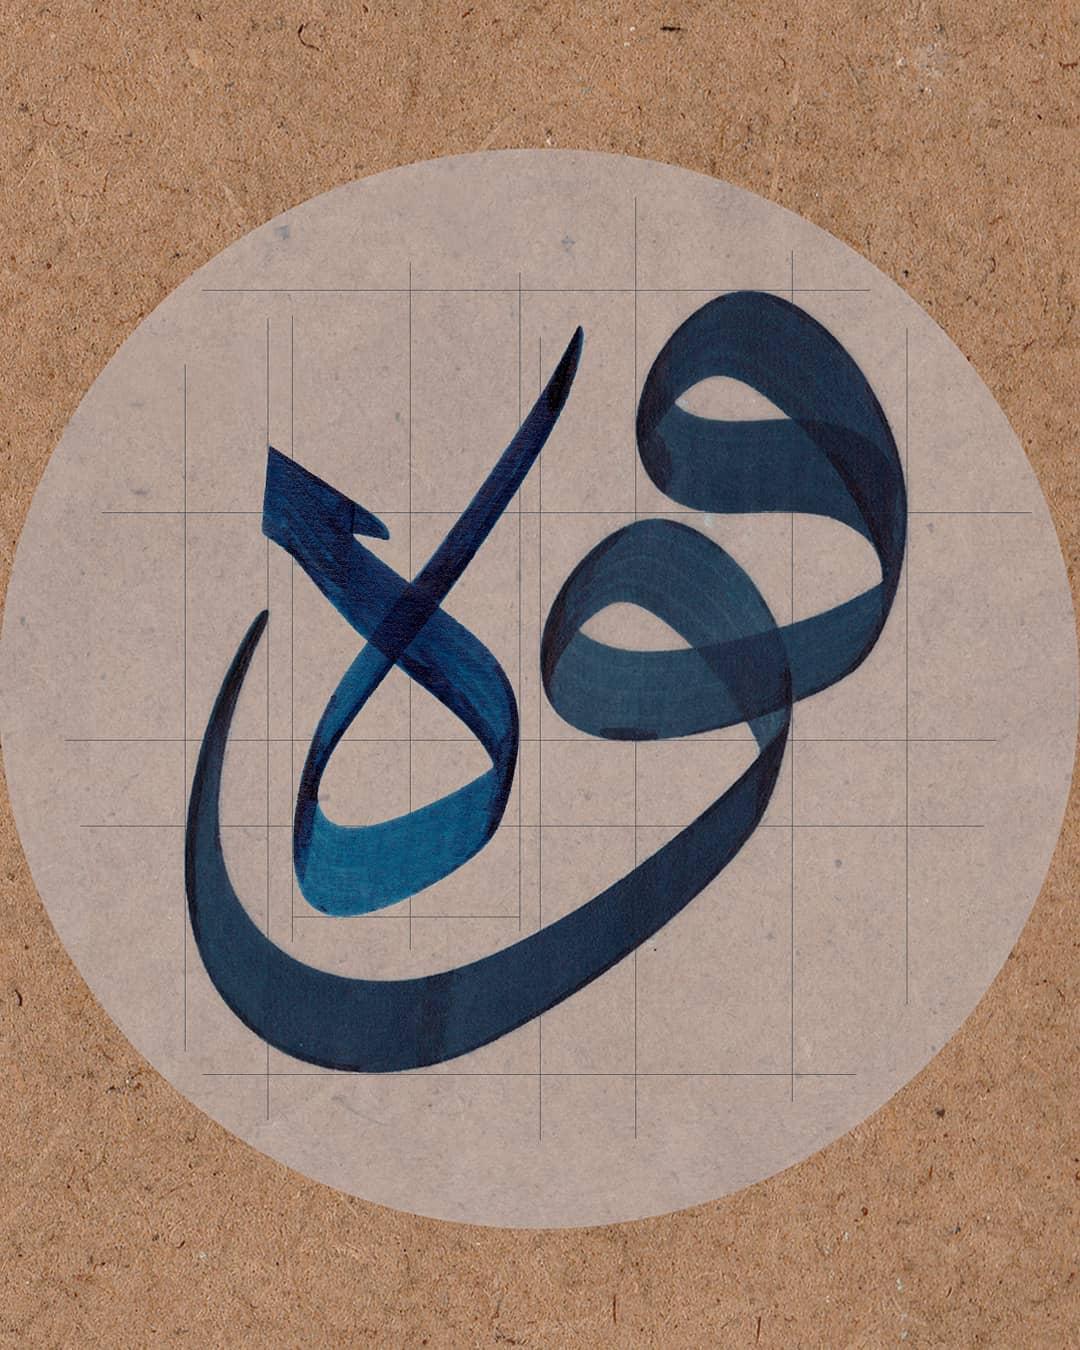 Hattat Kasım Kara قاسم قاره  Geometri…#islamicart #hatsanatı #hattat #art #sanat #kasımkara #tezhip #خطاط #… 875